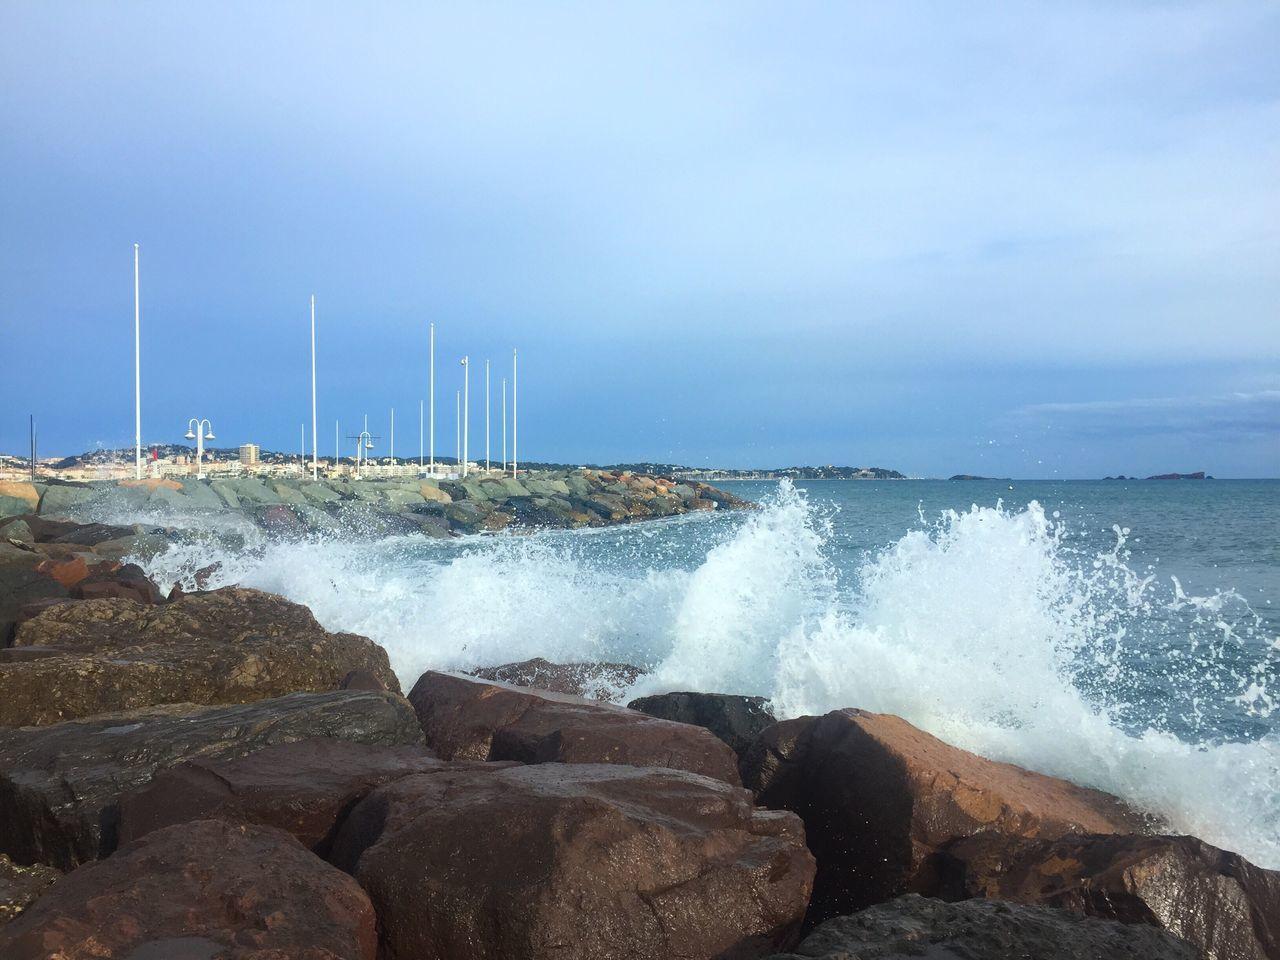 Power In Nature Bord De Mer Vague Rocher Mer Mediterranée Mer Sea Water Mer Mediterranée